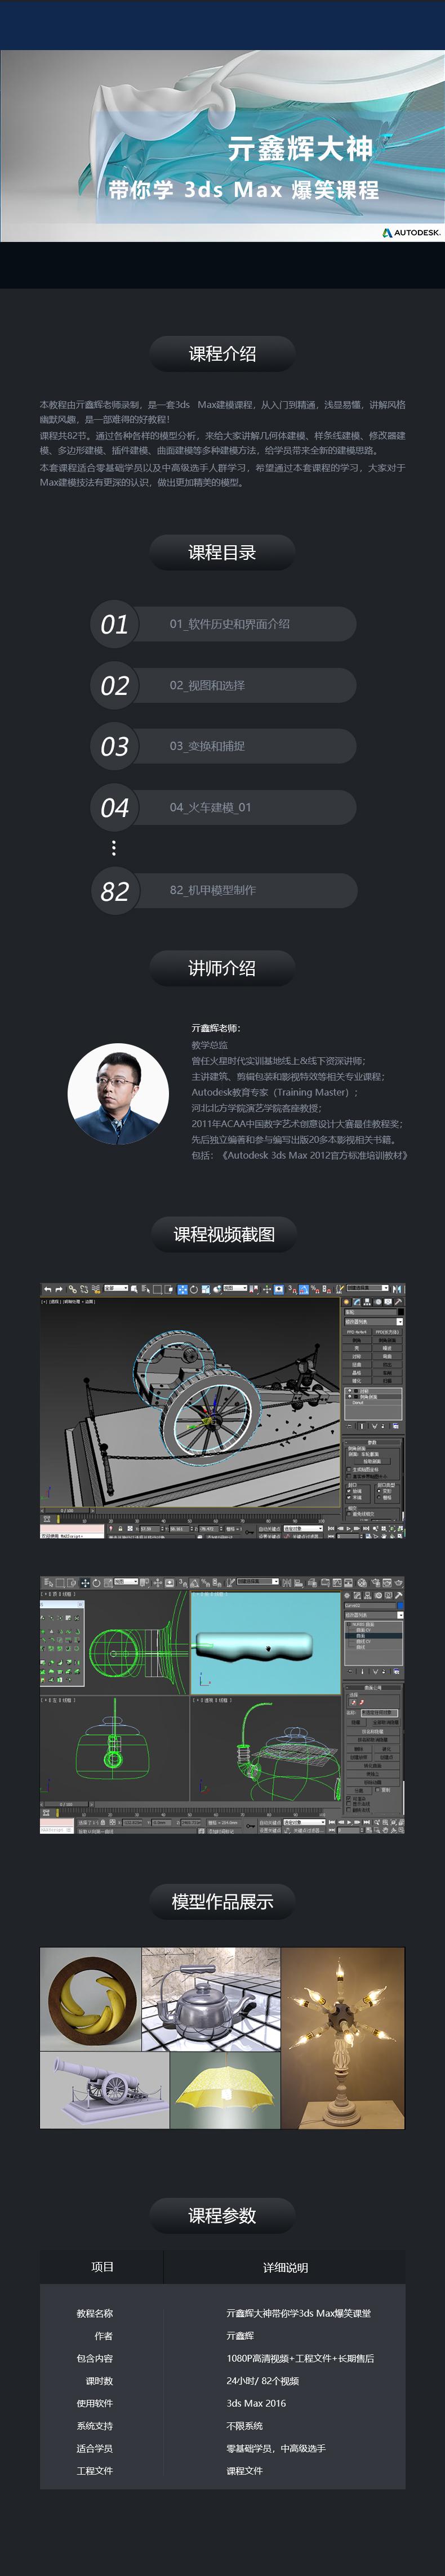 3ds Max爆笑课堂详情.jpg